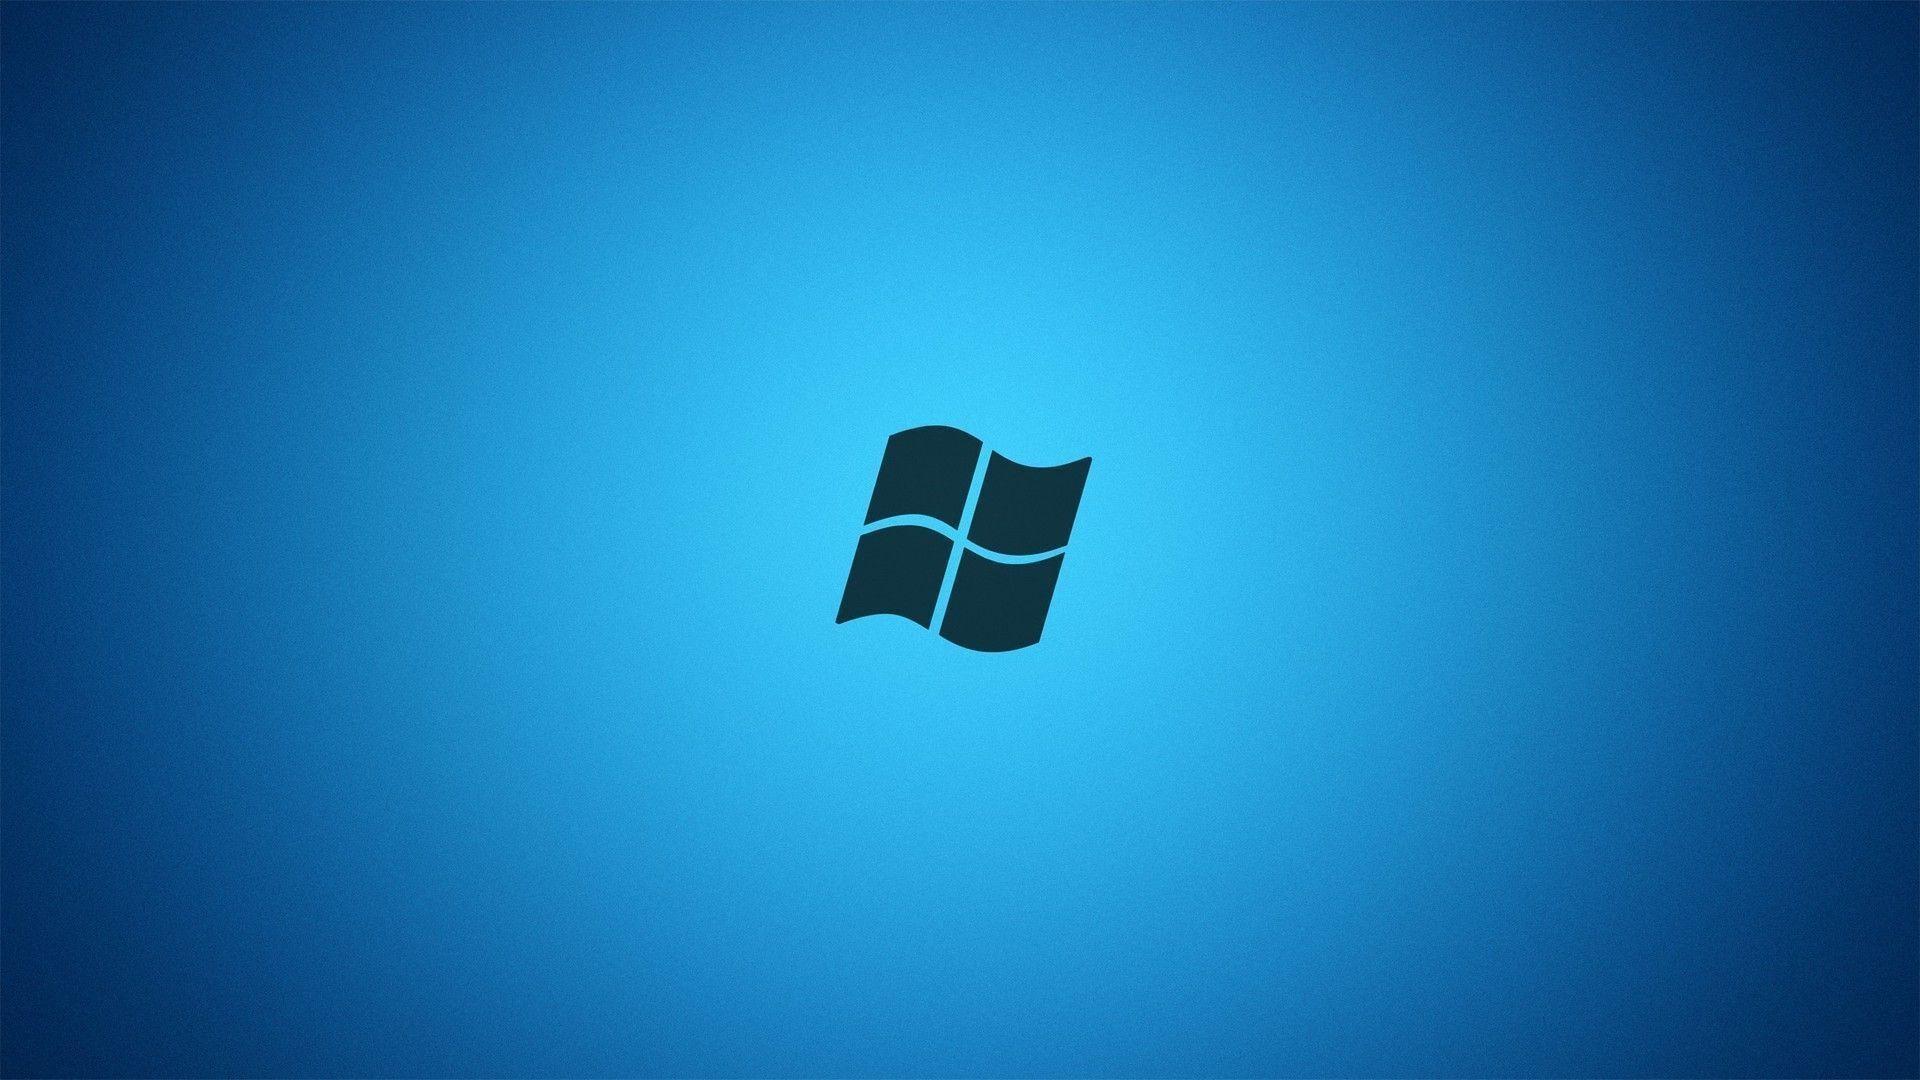 Windows 10 logo hd wallpaper 74 images - Windows 10 4k wallpaper pack ...